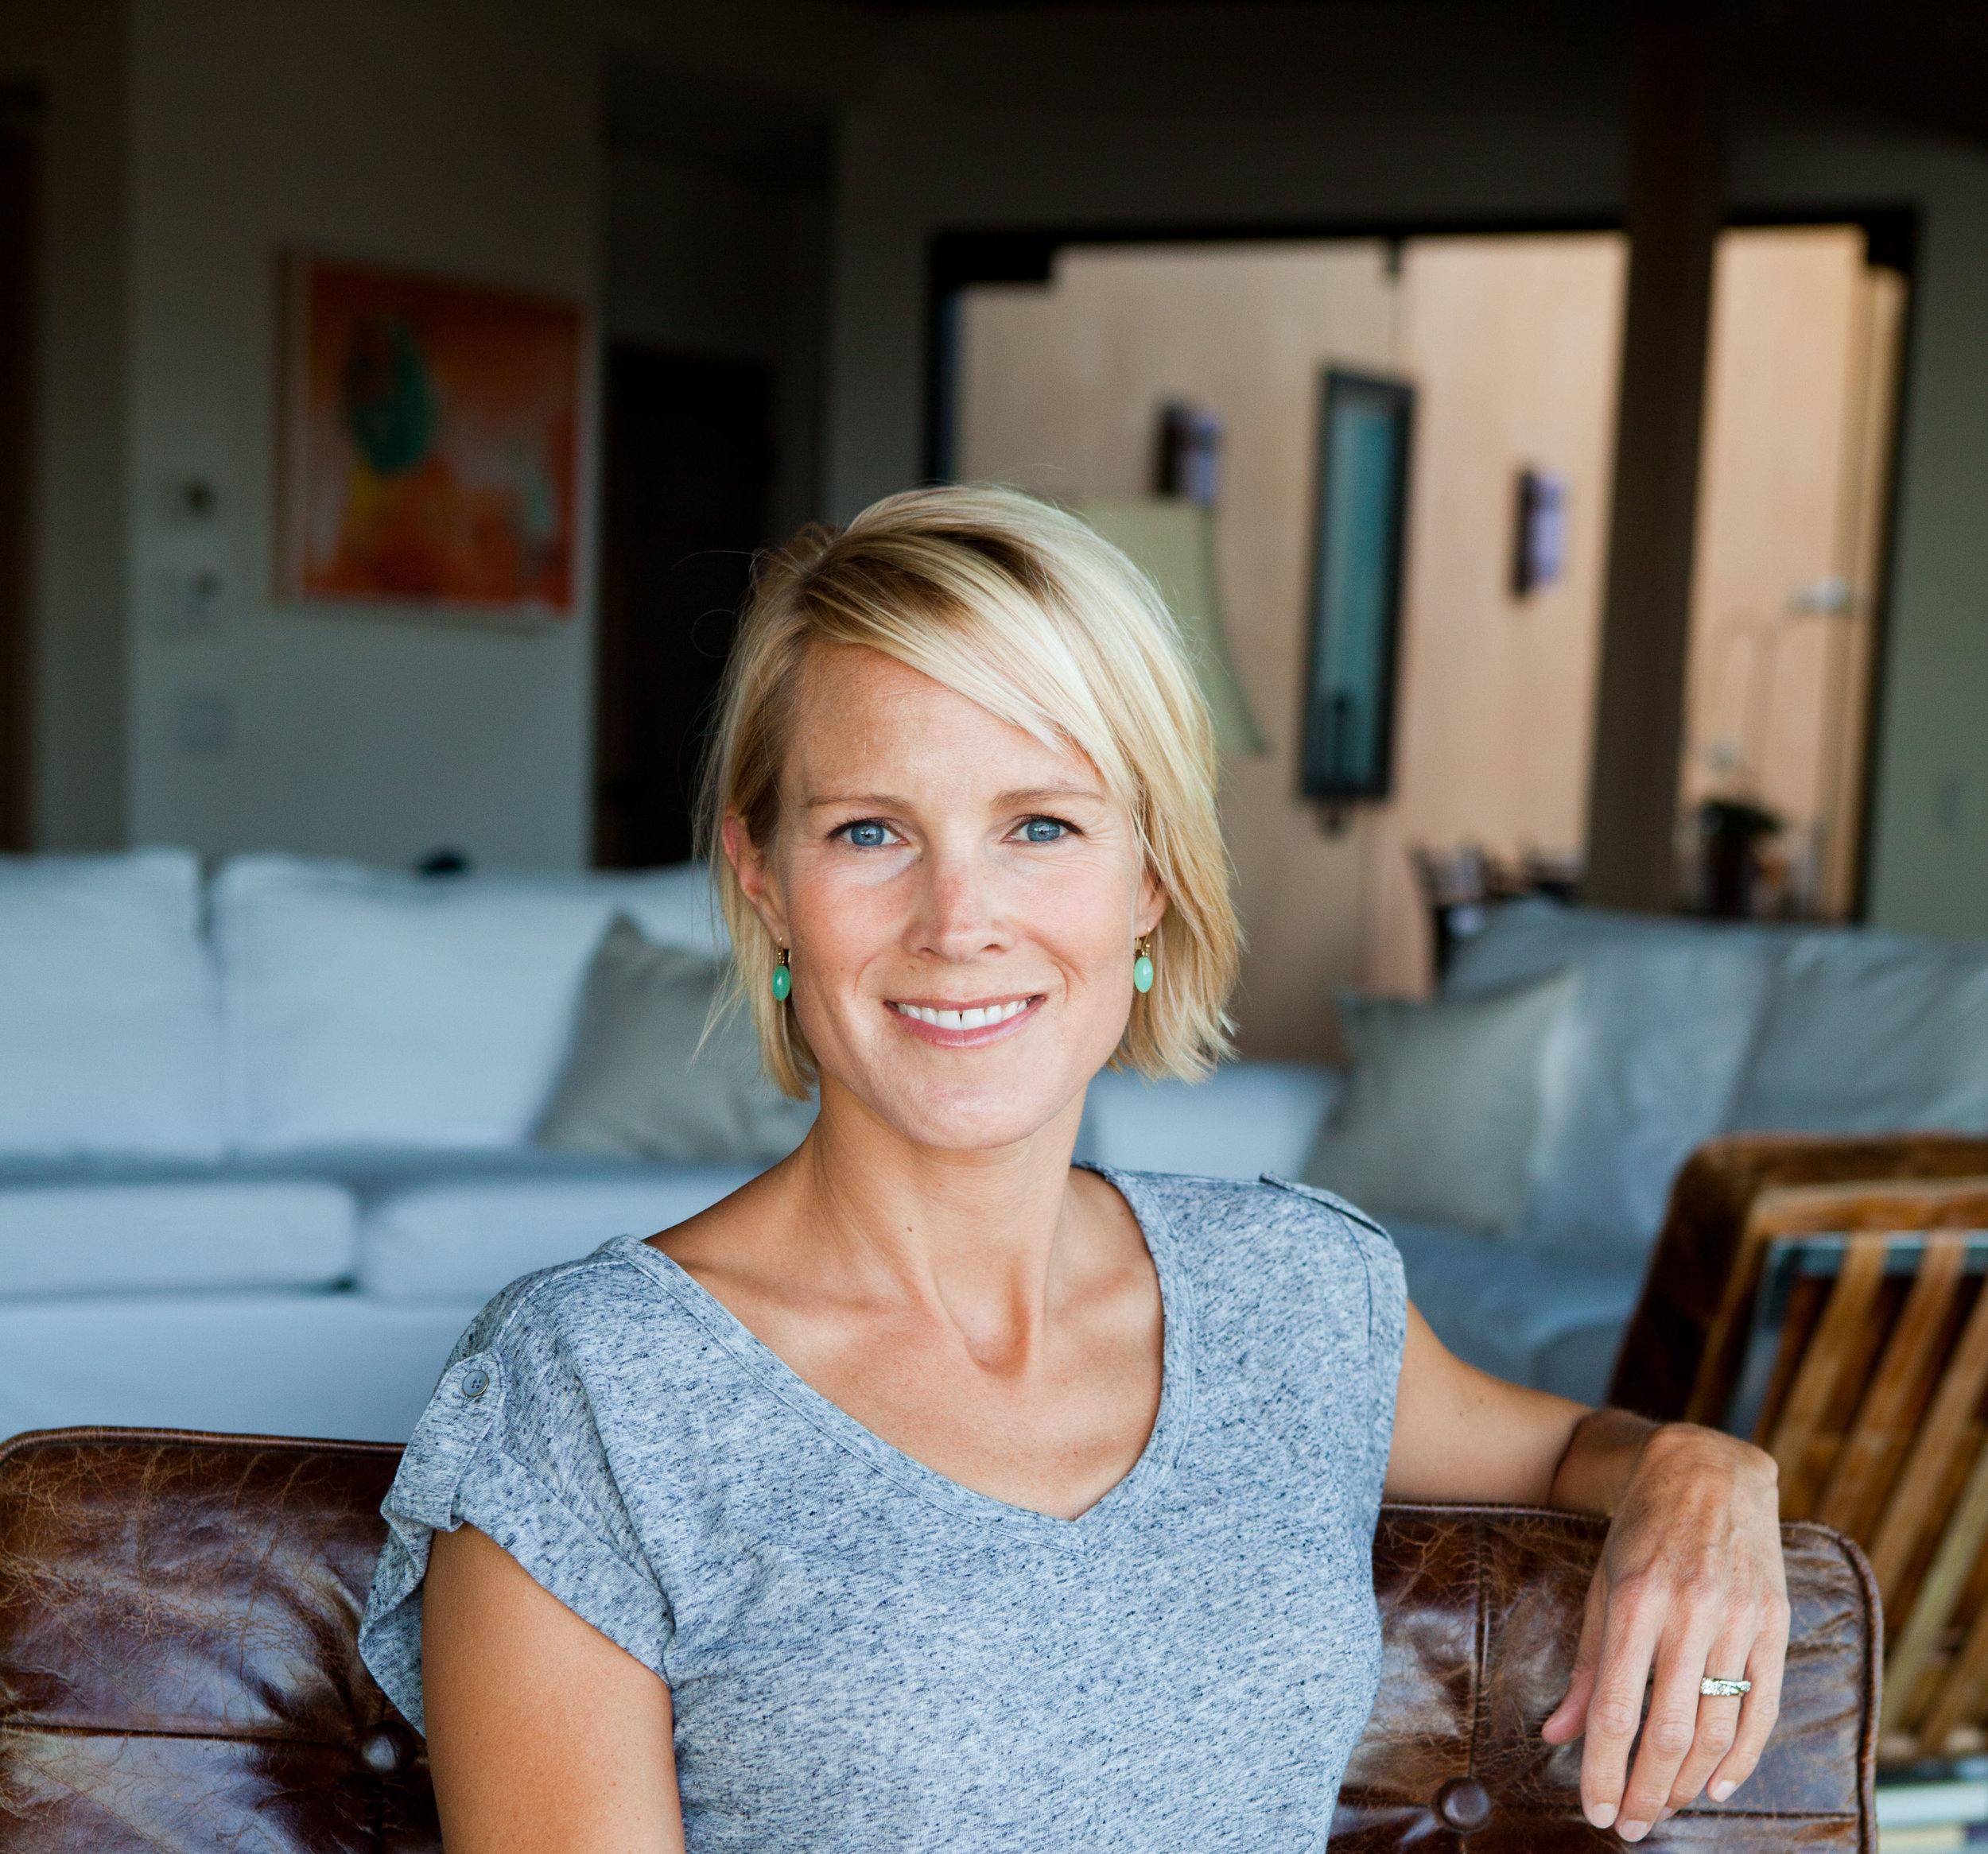 Sarah Vanderveen - Founder, owner of Brooks Street Books